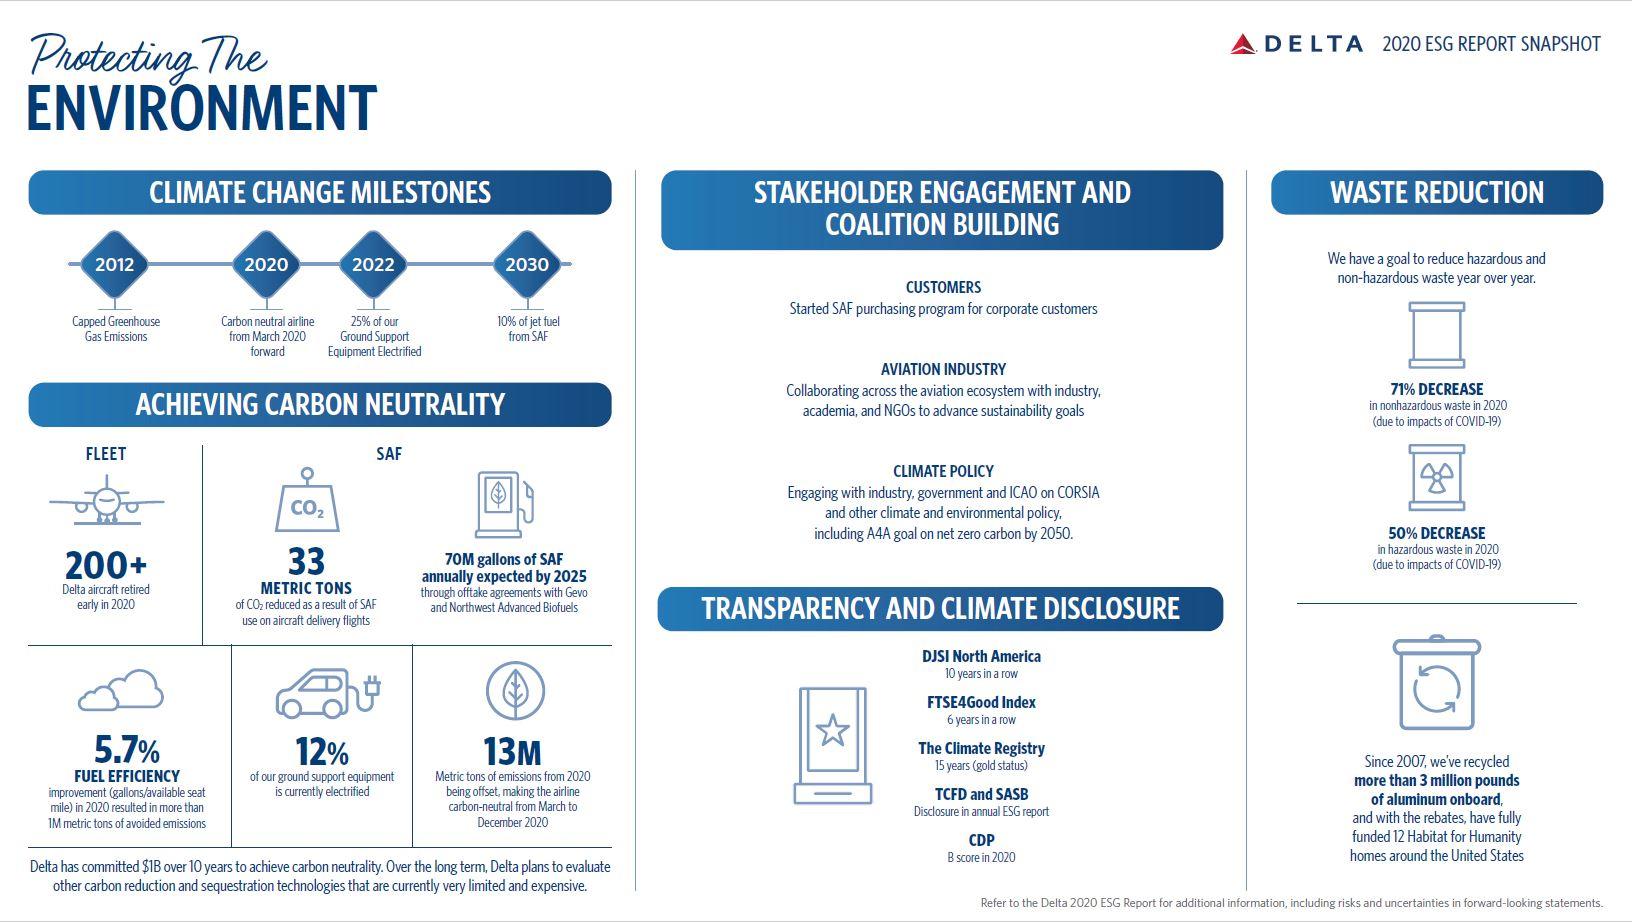 Data that gives a recap of Delta's 2020 ESG Report